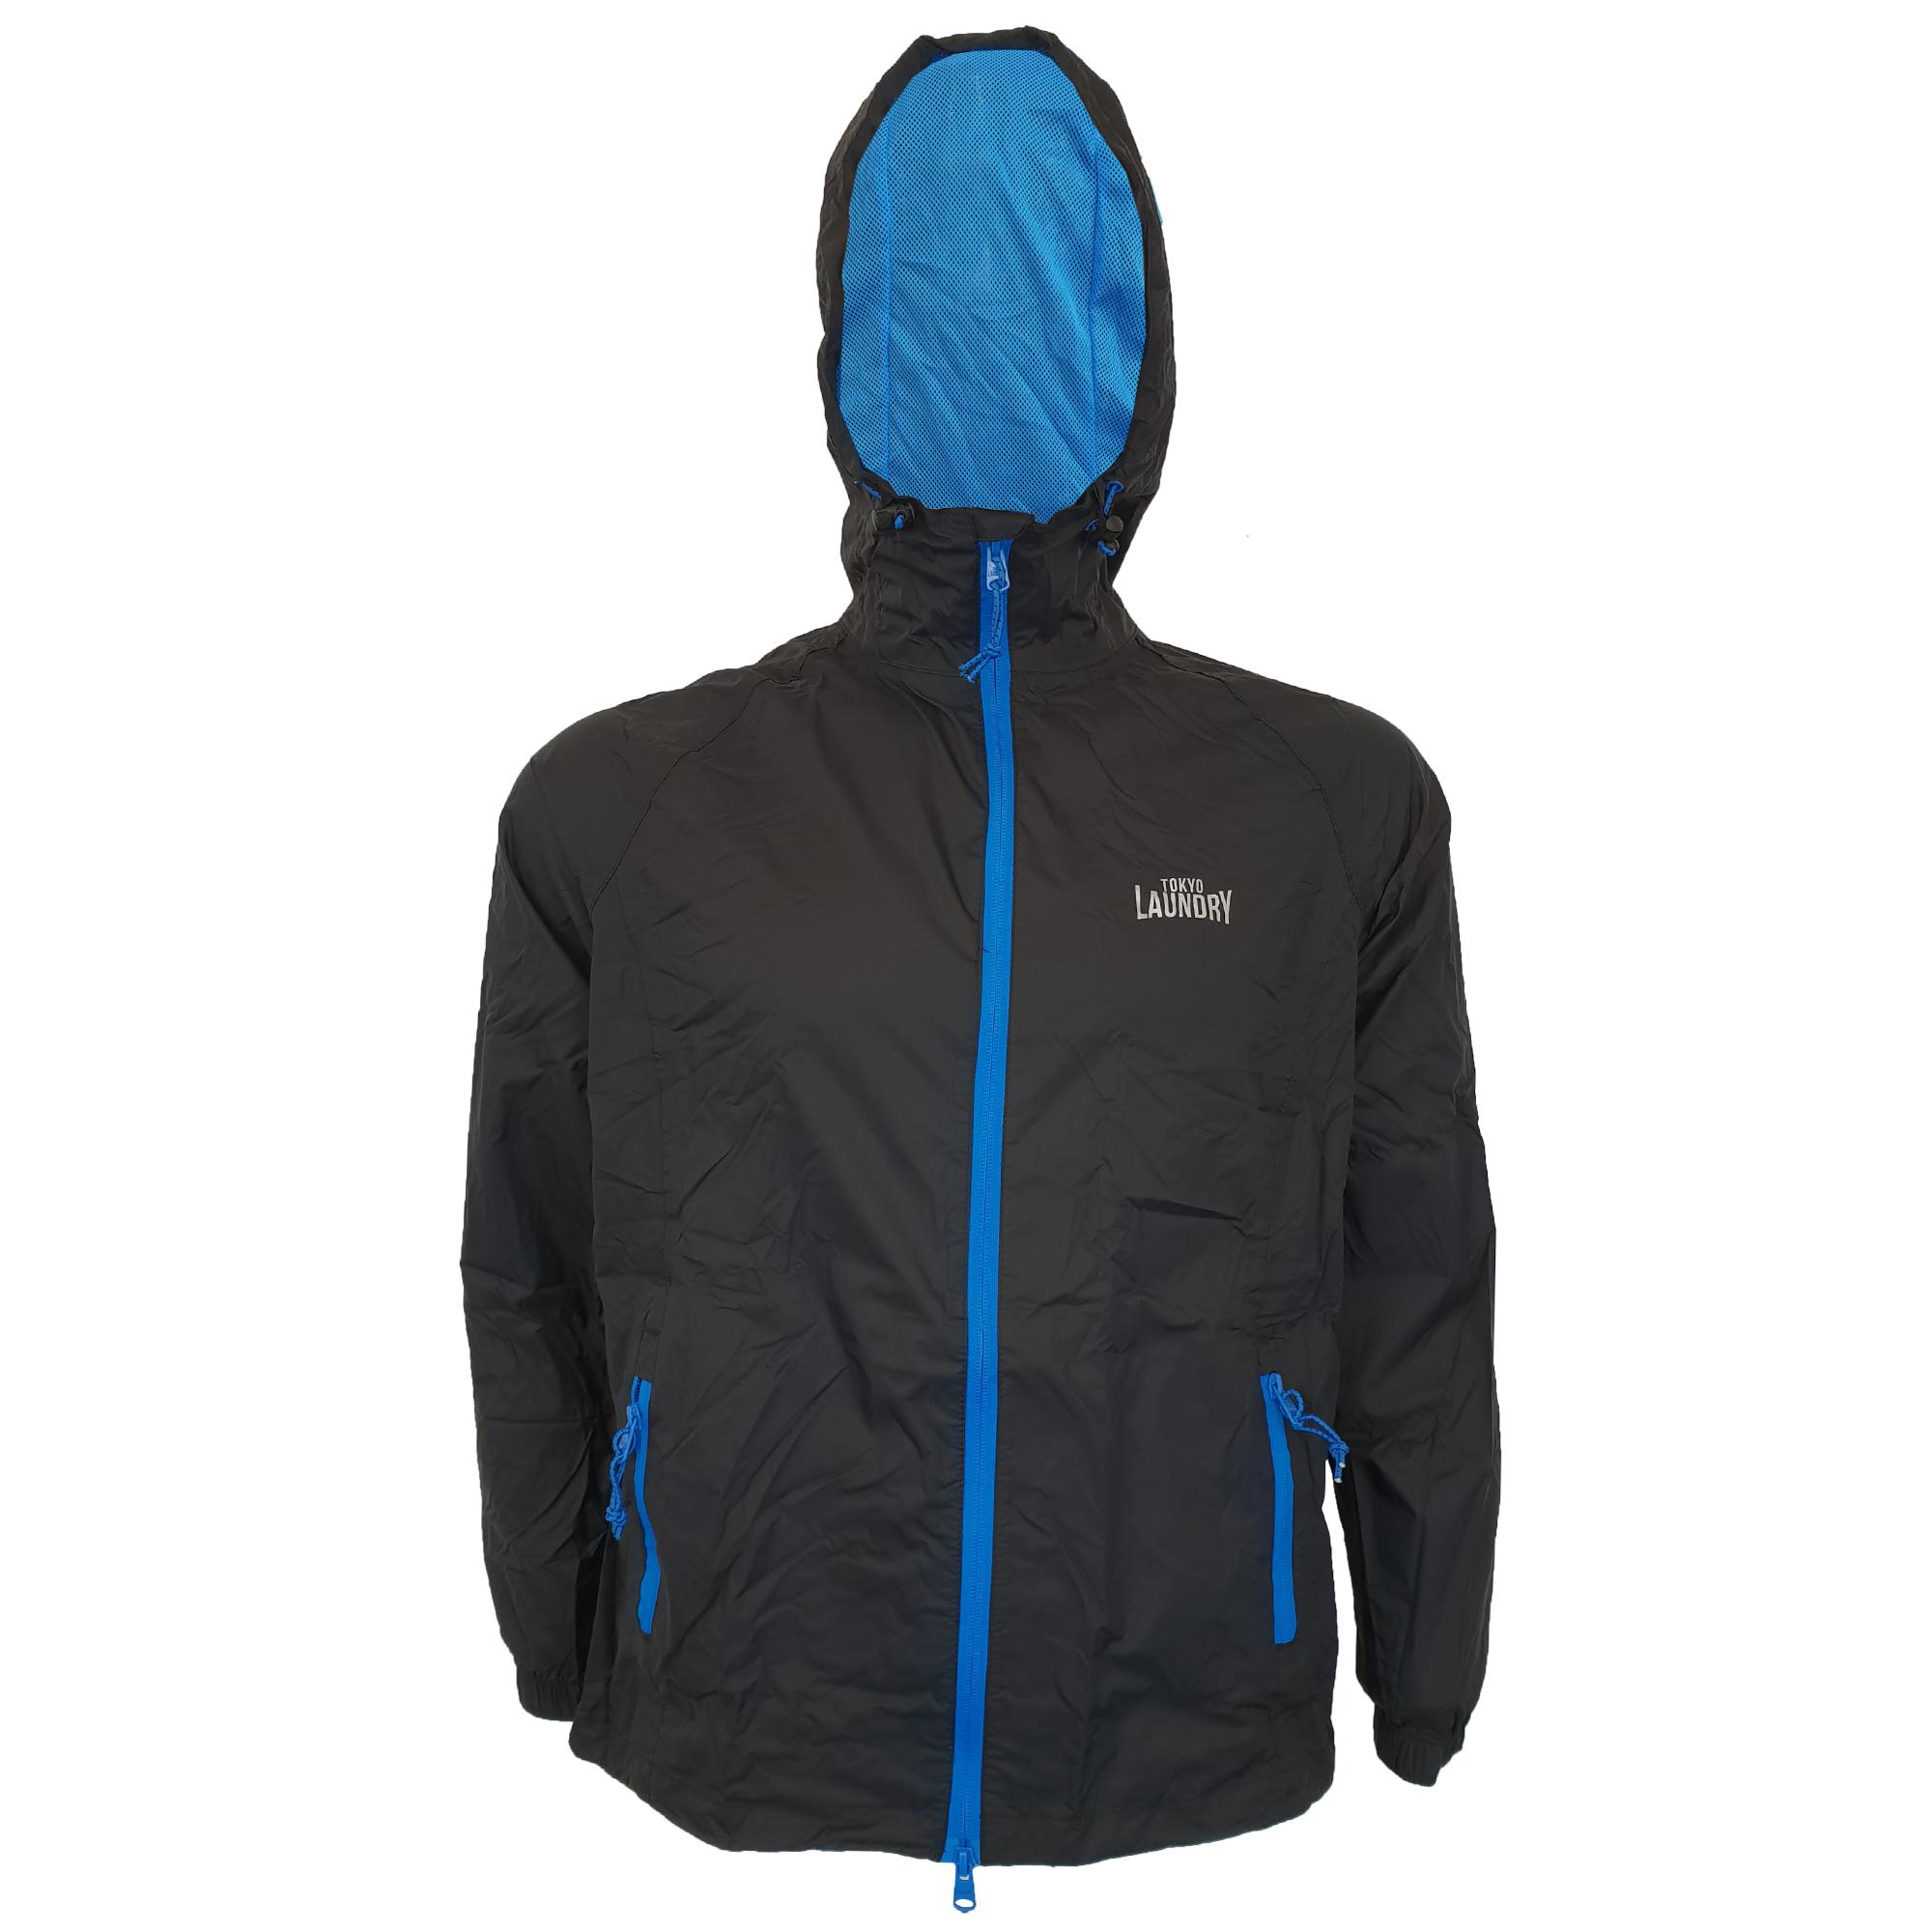 Mens-Kagool-Breathable-Hooded-Jacket-Tokyo-Laundry-Waterproof-Coat-Windproof-New thumbnail 3